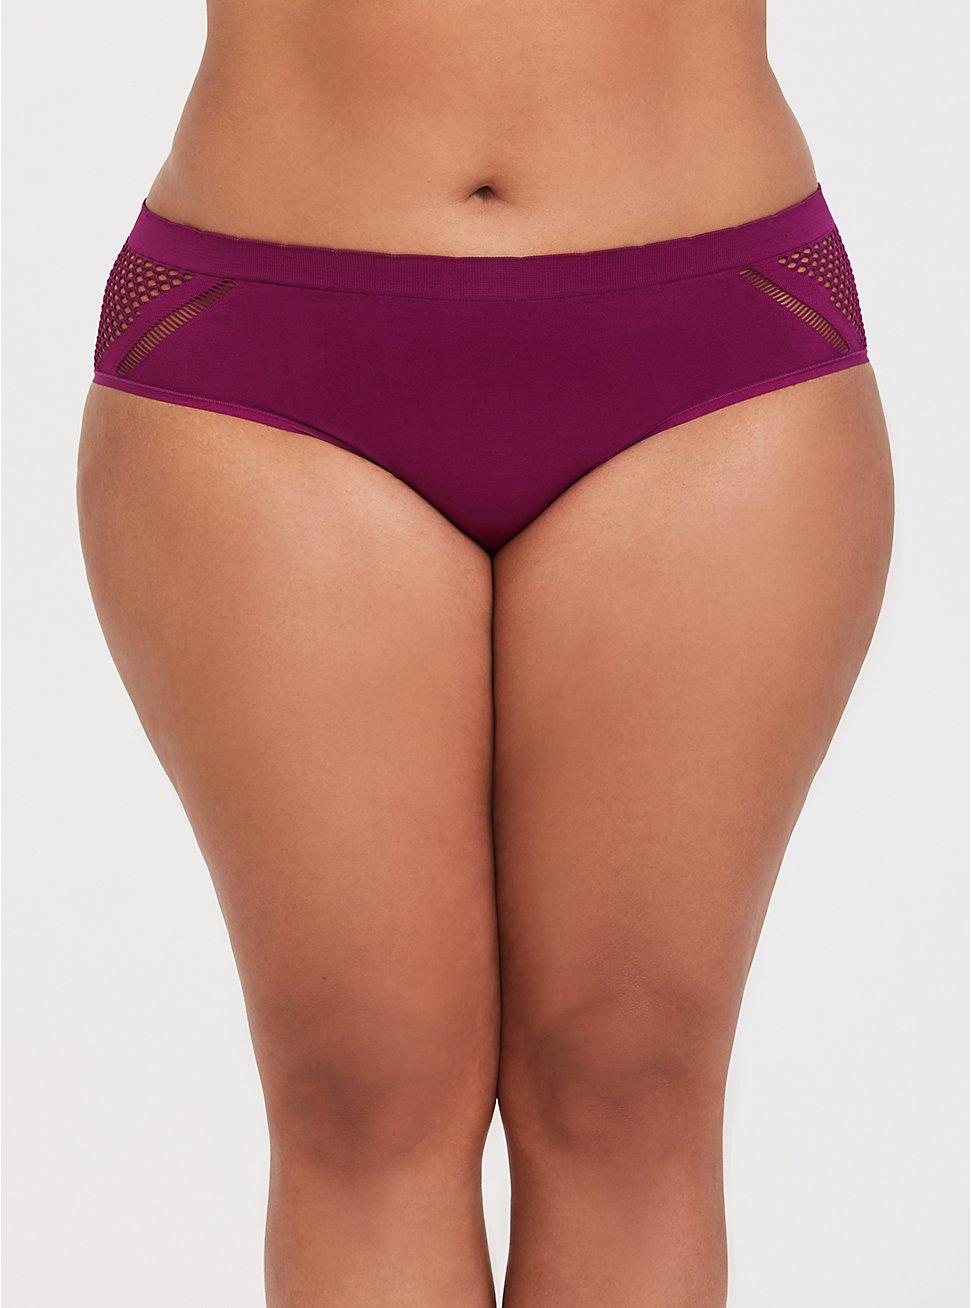 Berry Purple Laser Cut Seamless Hipster Panty, NAVARRA-PURPLE, hi-res